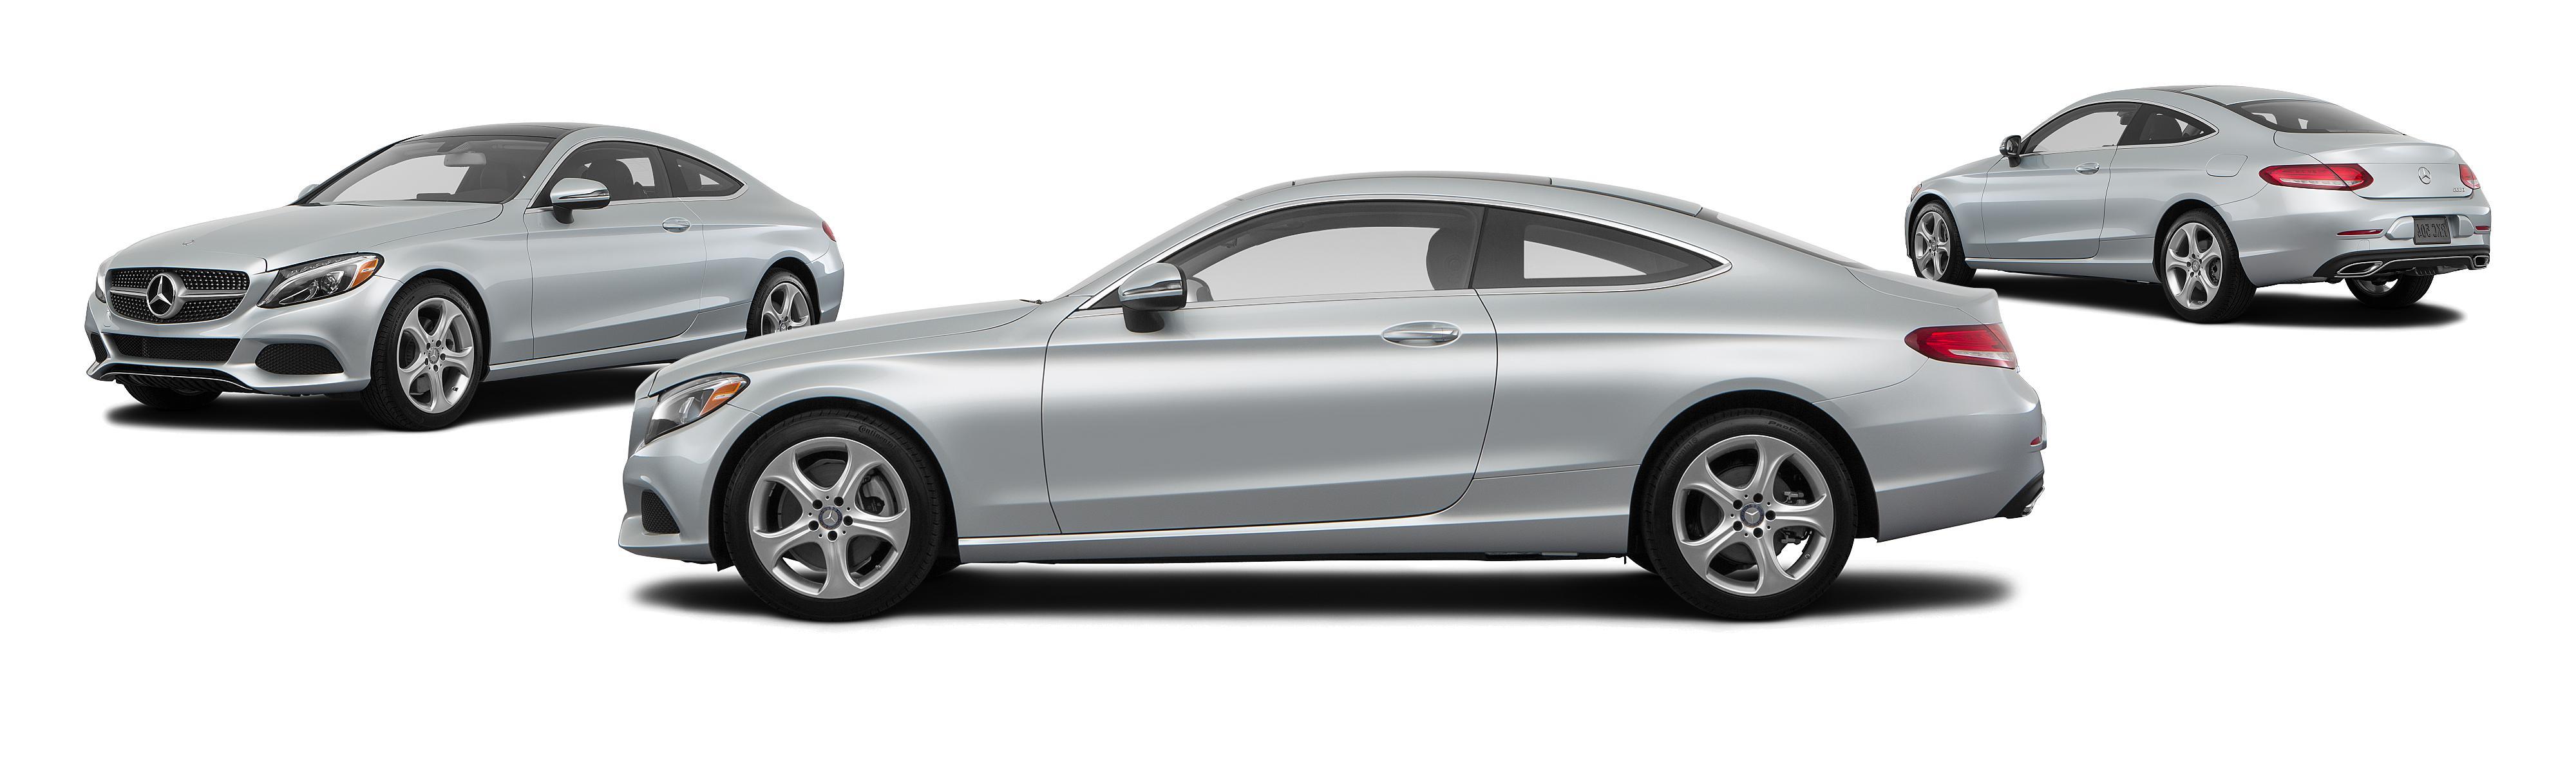 2017 mercedes benz c class c 300 2dr coupe iridium silver metallic posite large